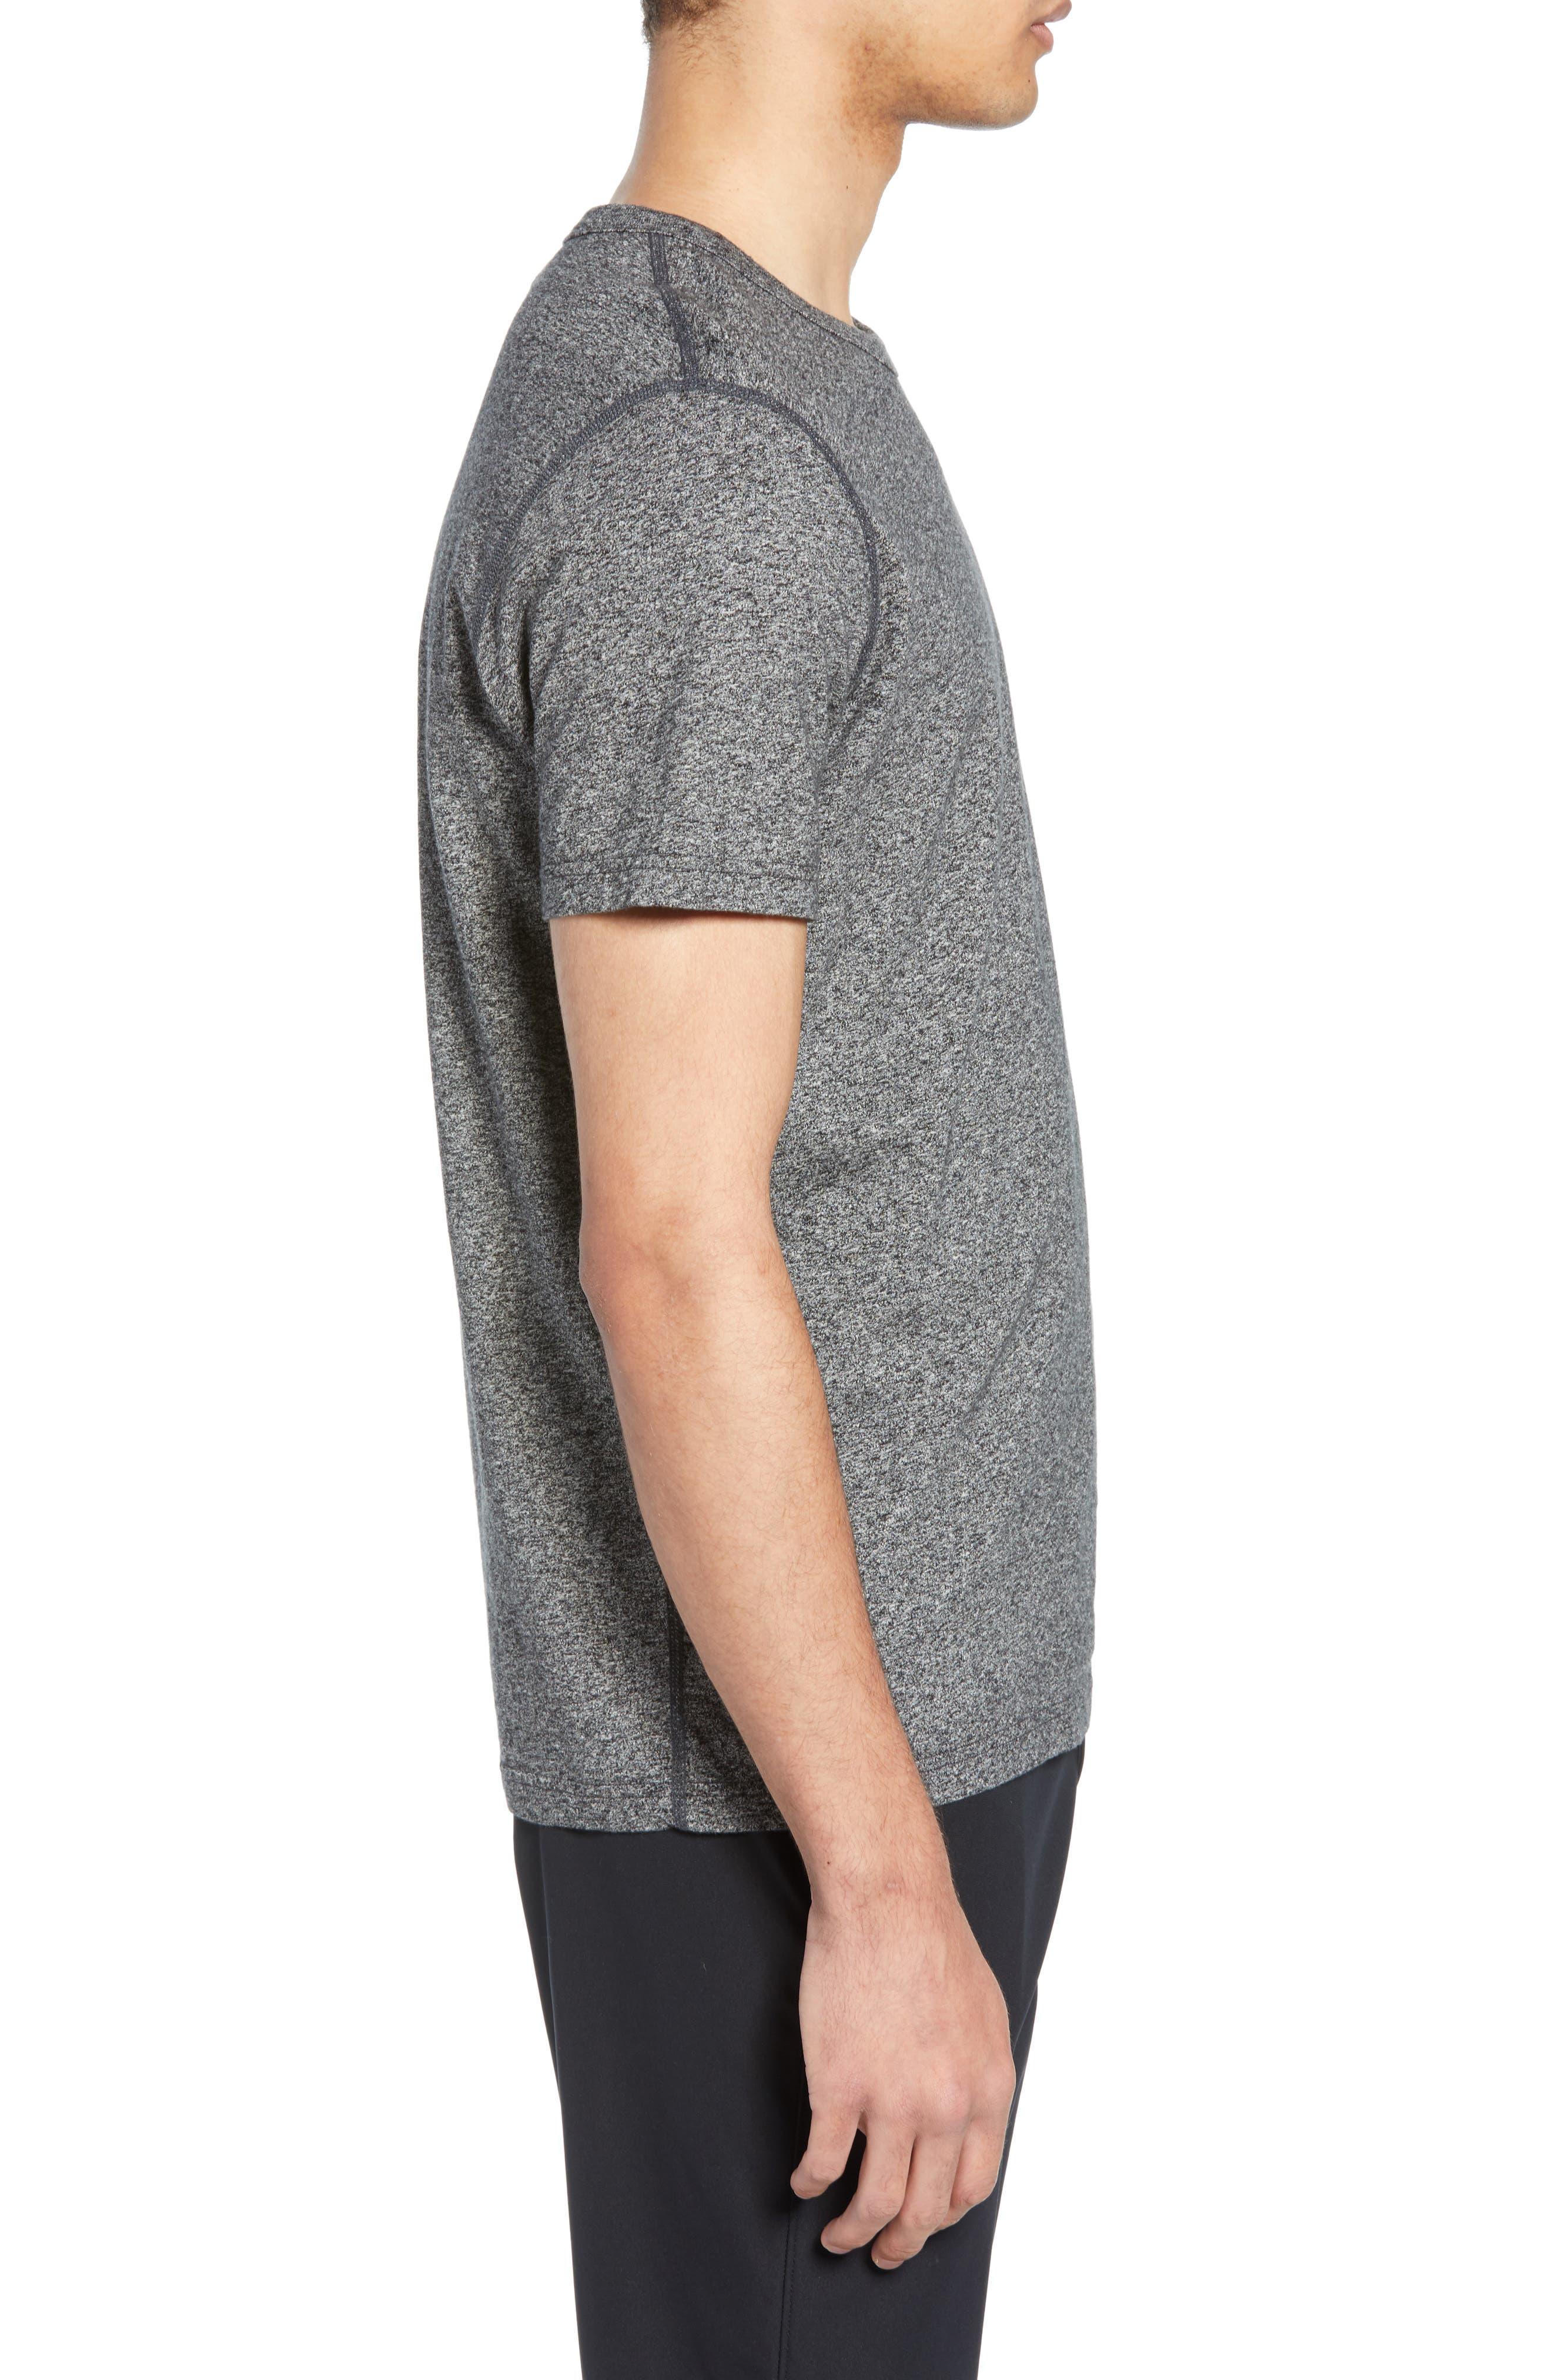 REIGNING CHAMP,                             Short Sleeve Crewneck T-Shirt,                             Alternate thumbnail 3, color,                             MEDIUM BLACK